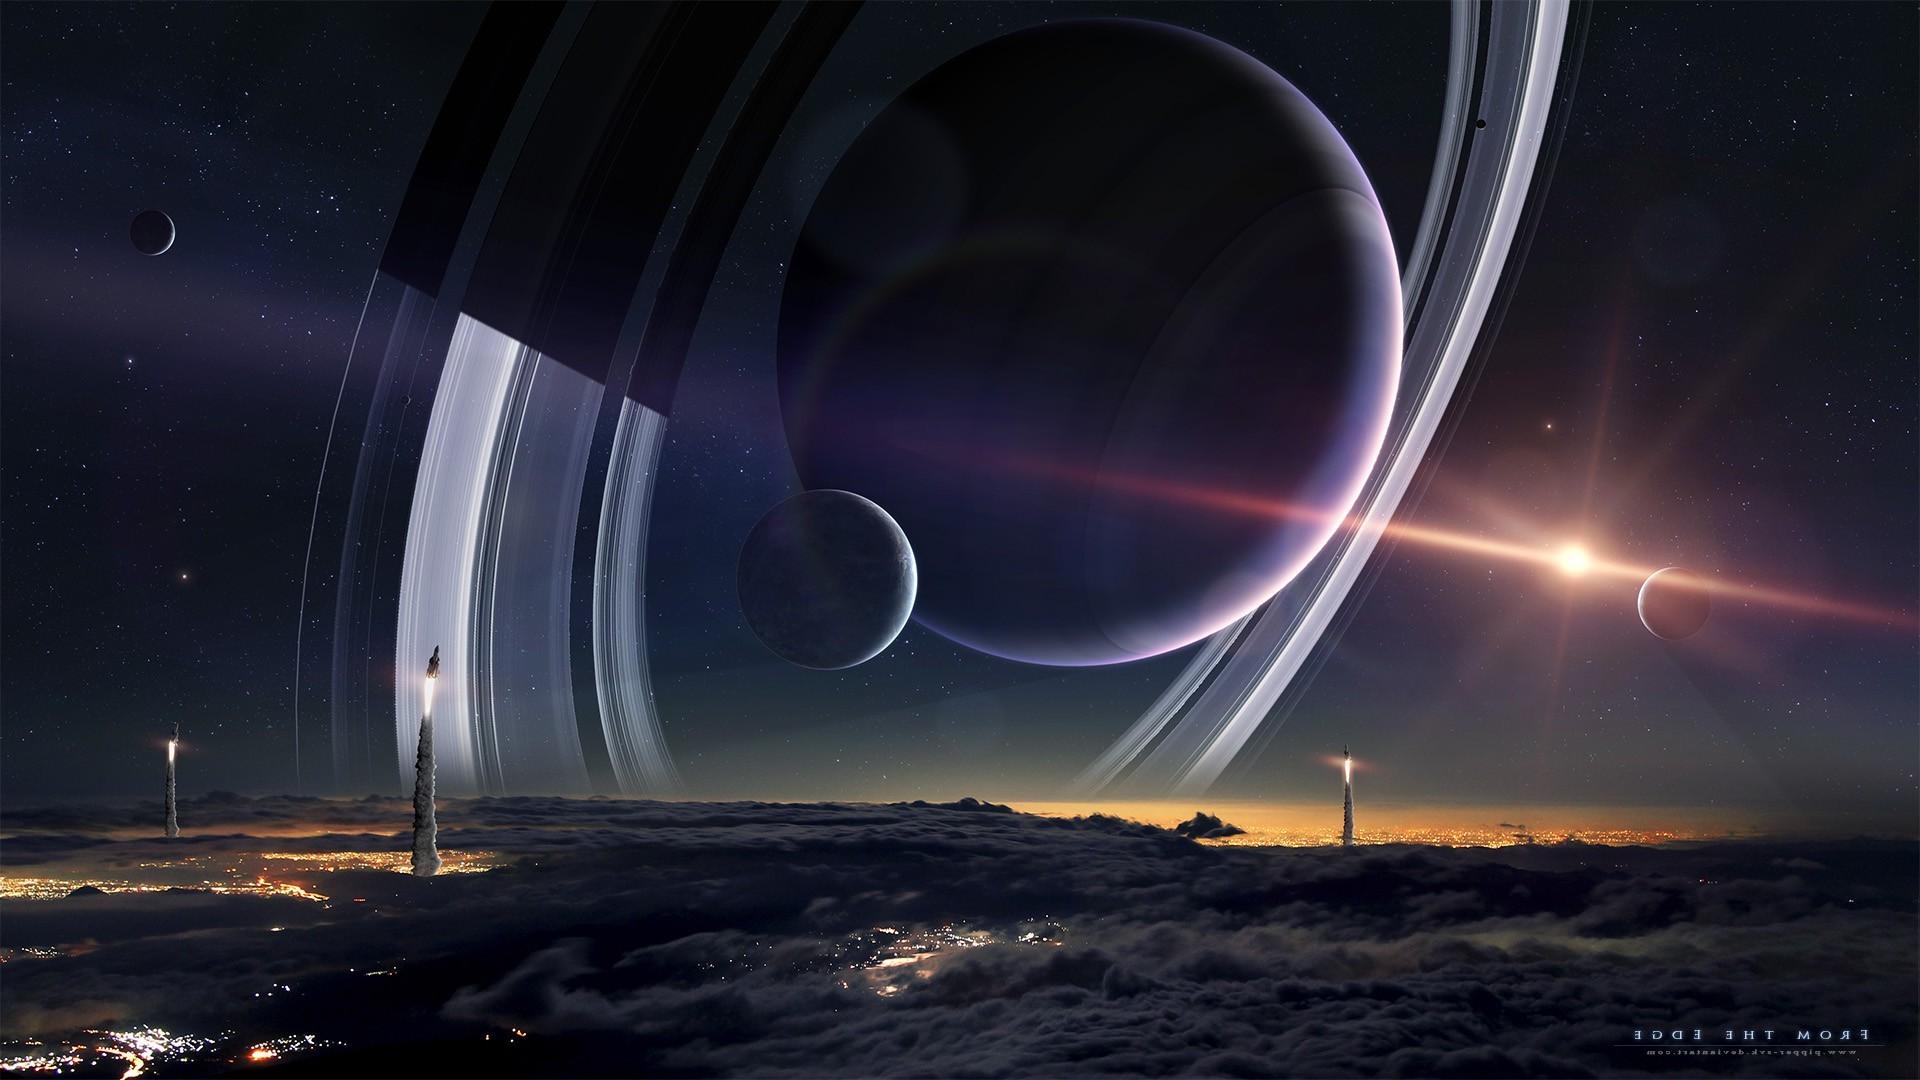 Alien Planet Windows 7 3d Wallpaper Space Planet Wallpapers 76 Images